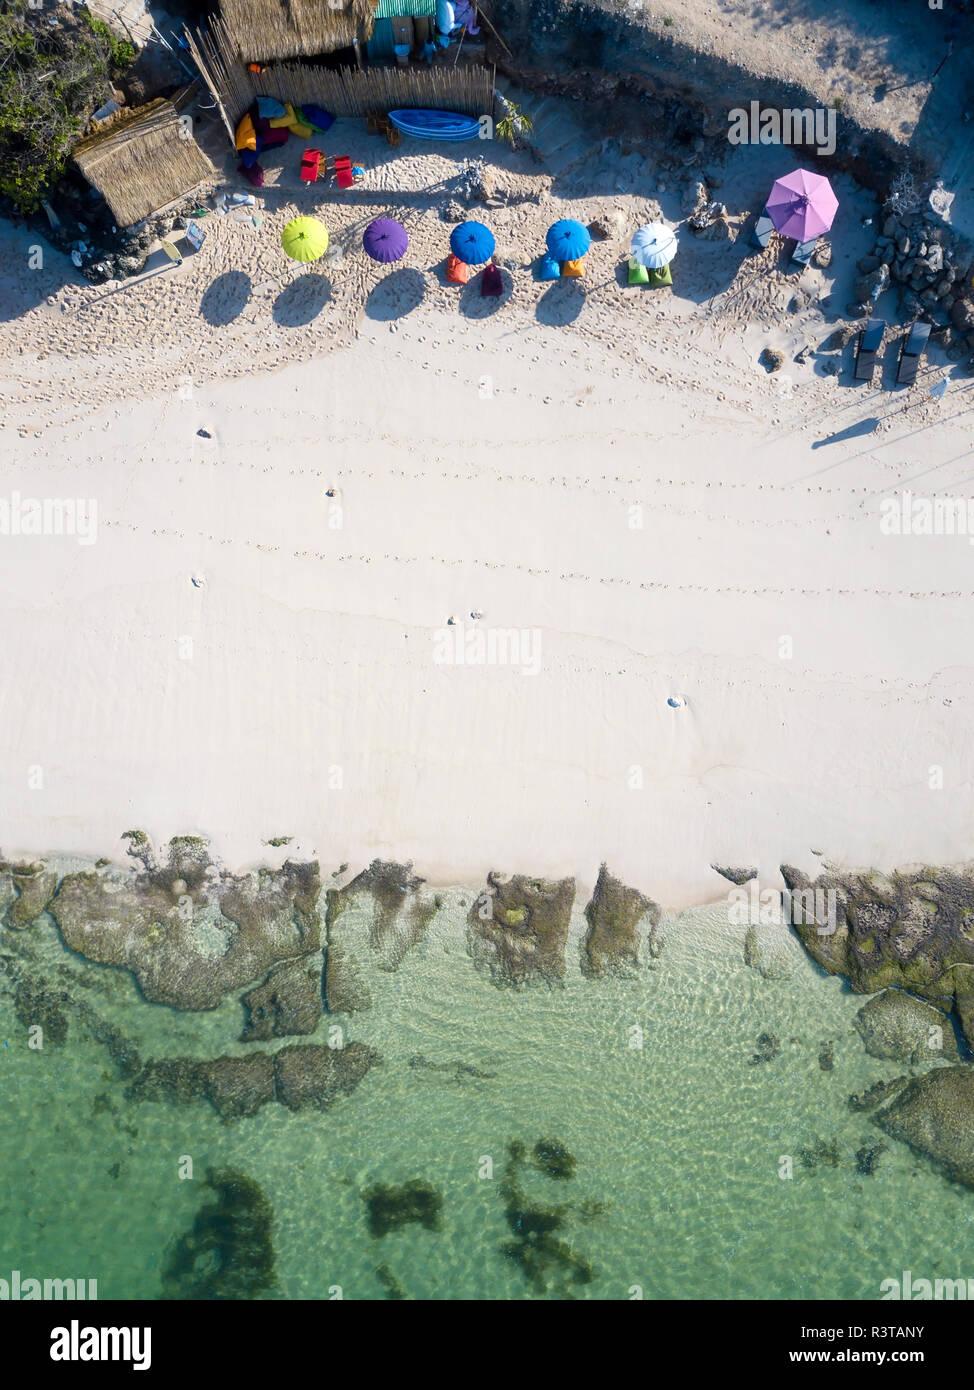 Indonesia, Bali, Aerial view of Melasti beach - Stock Image